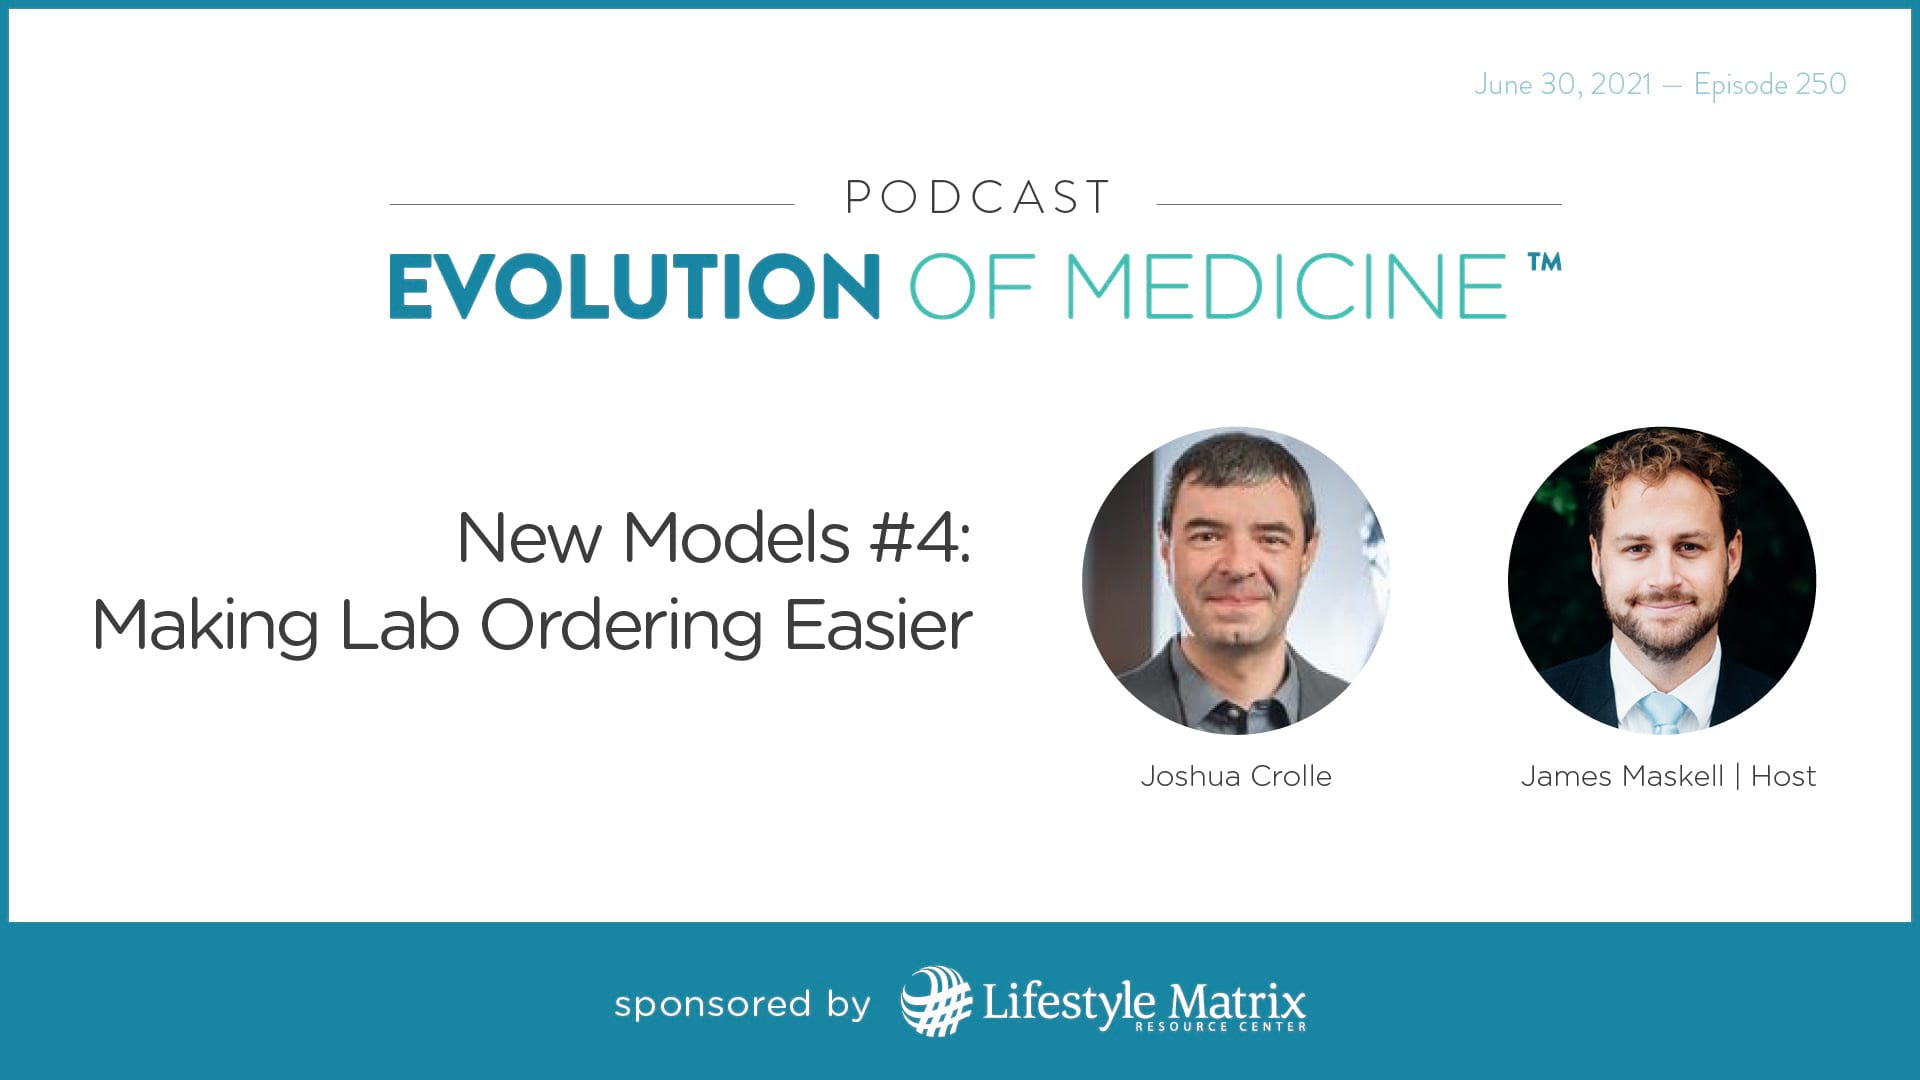 New Models #4: Making Lab Ordering Easier